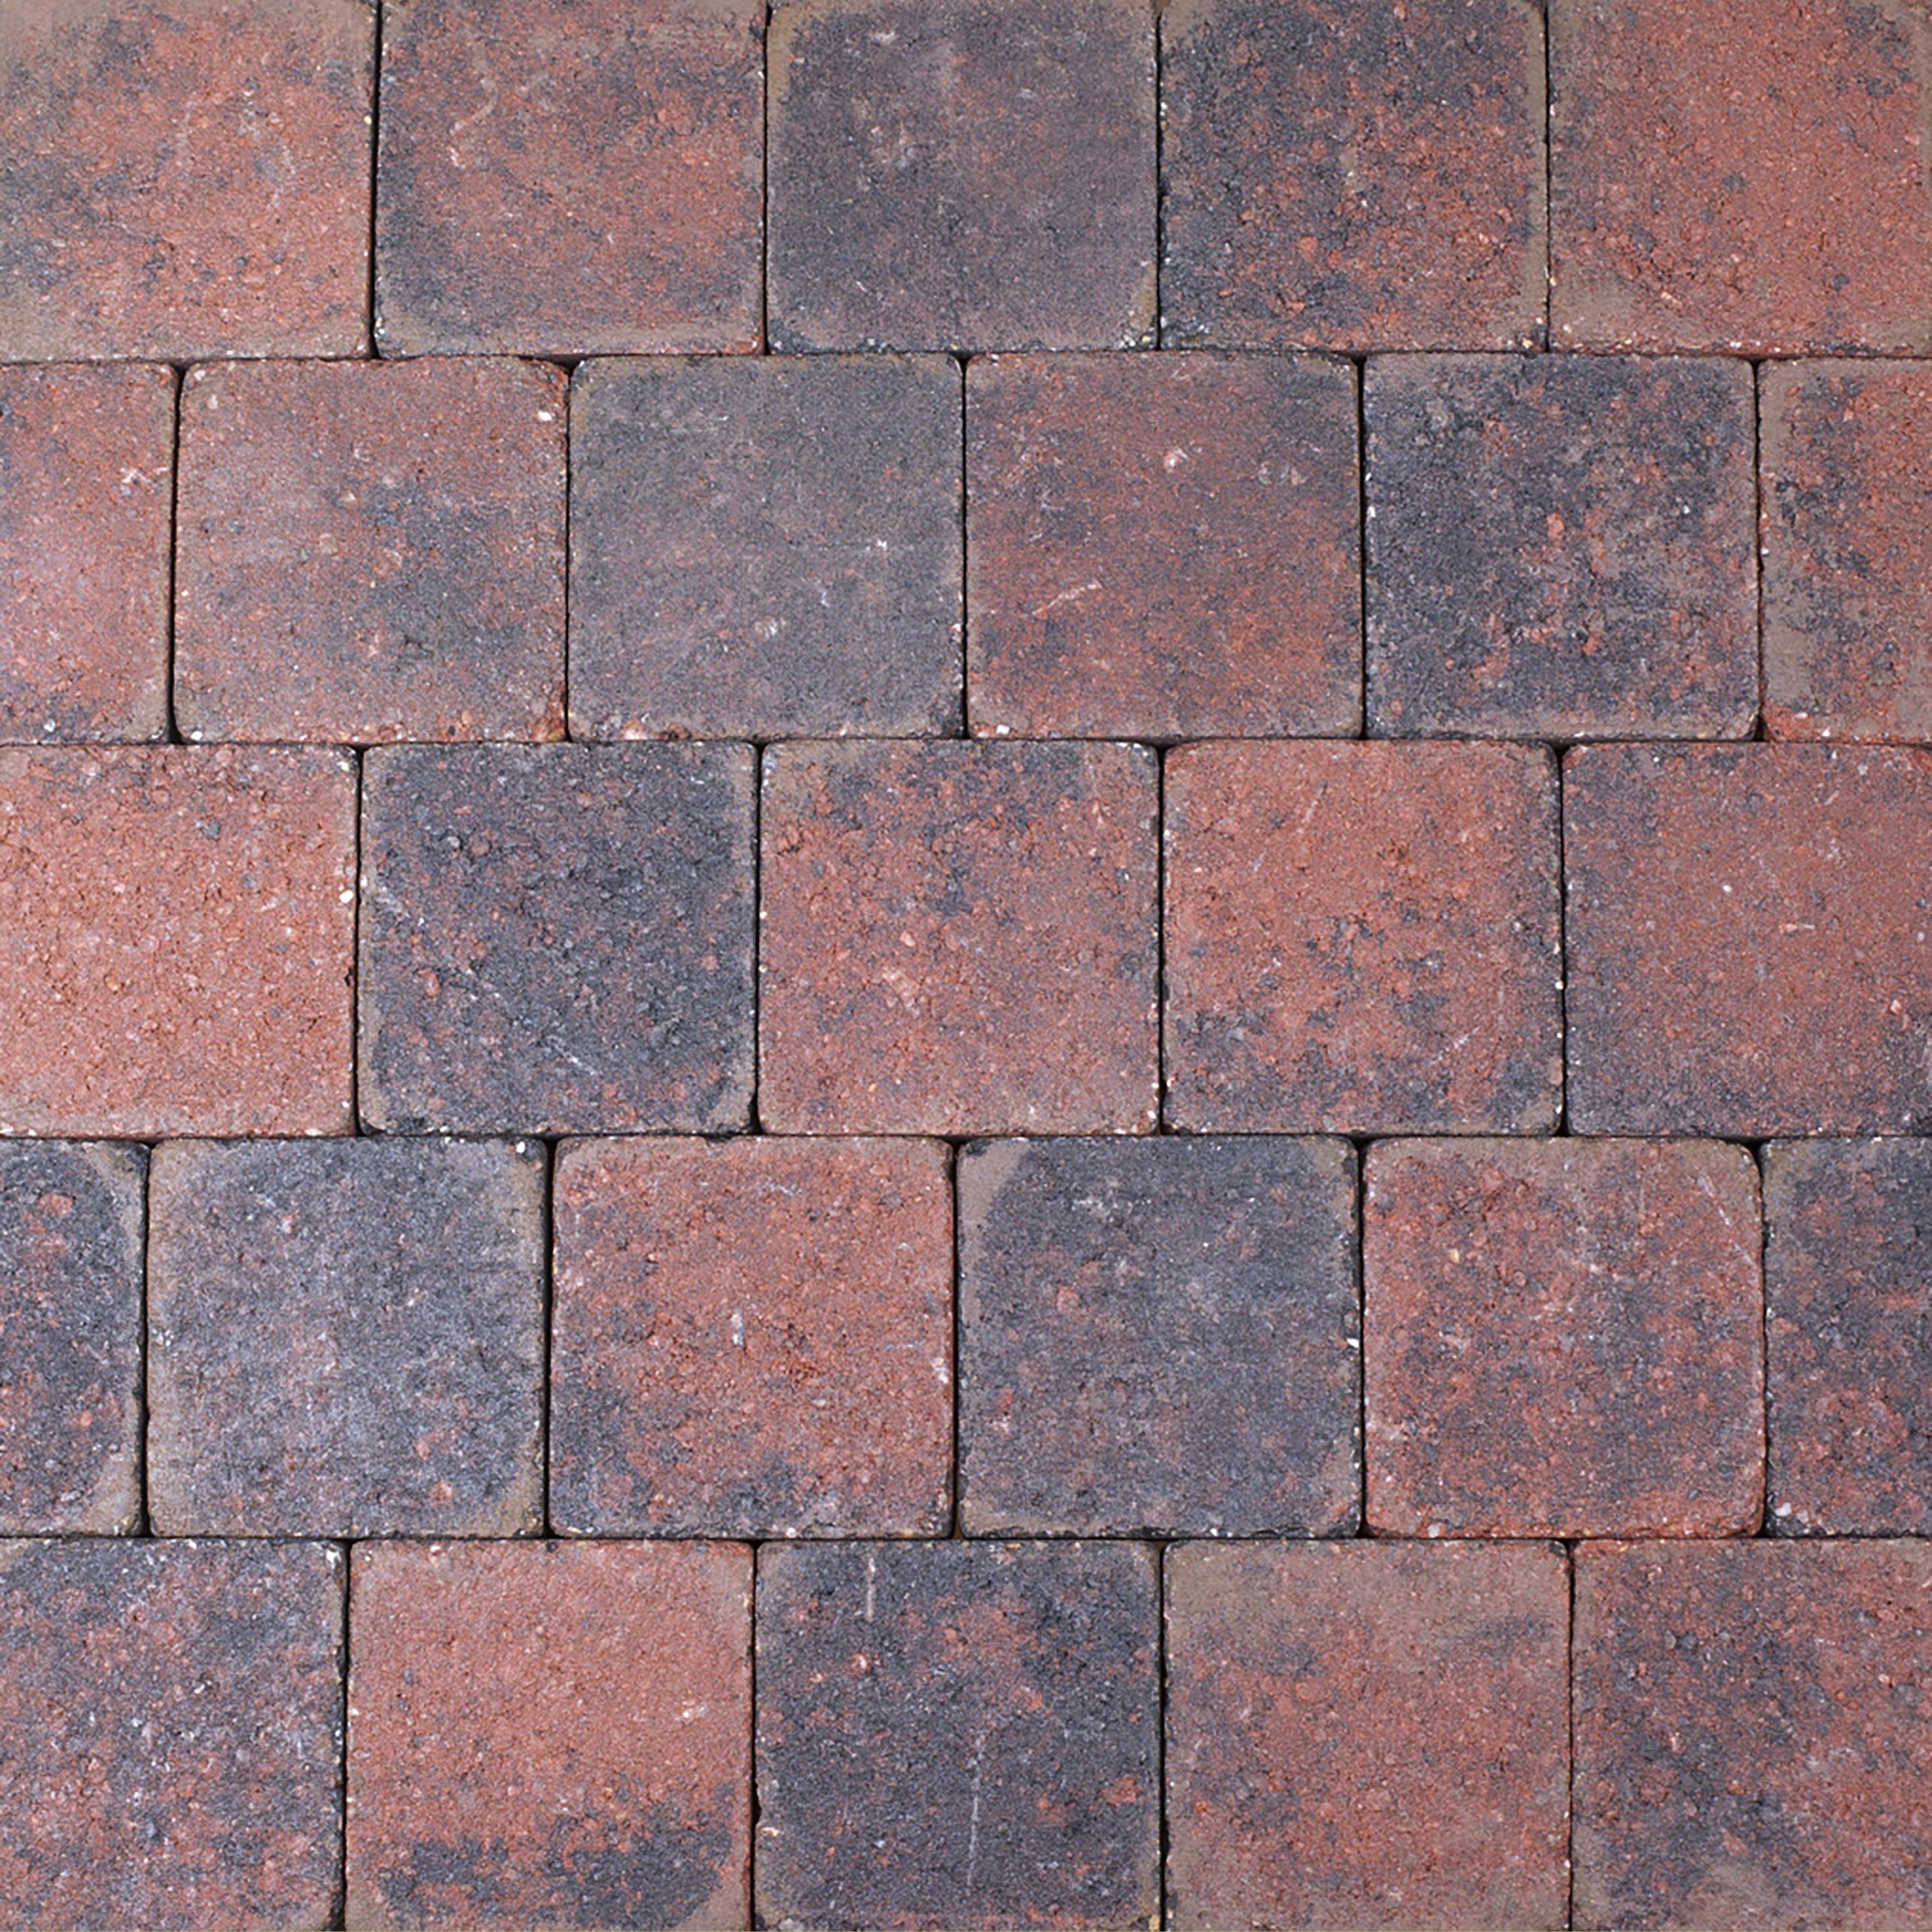 Trommelsteen Beton Rood/Zwart 14x14x7 cm - 405 Stuks - 7,94 m2